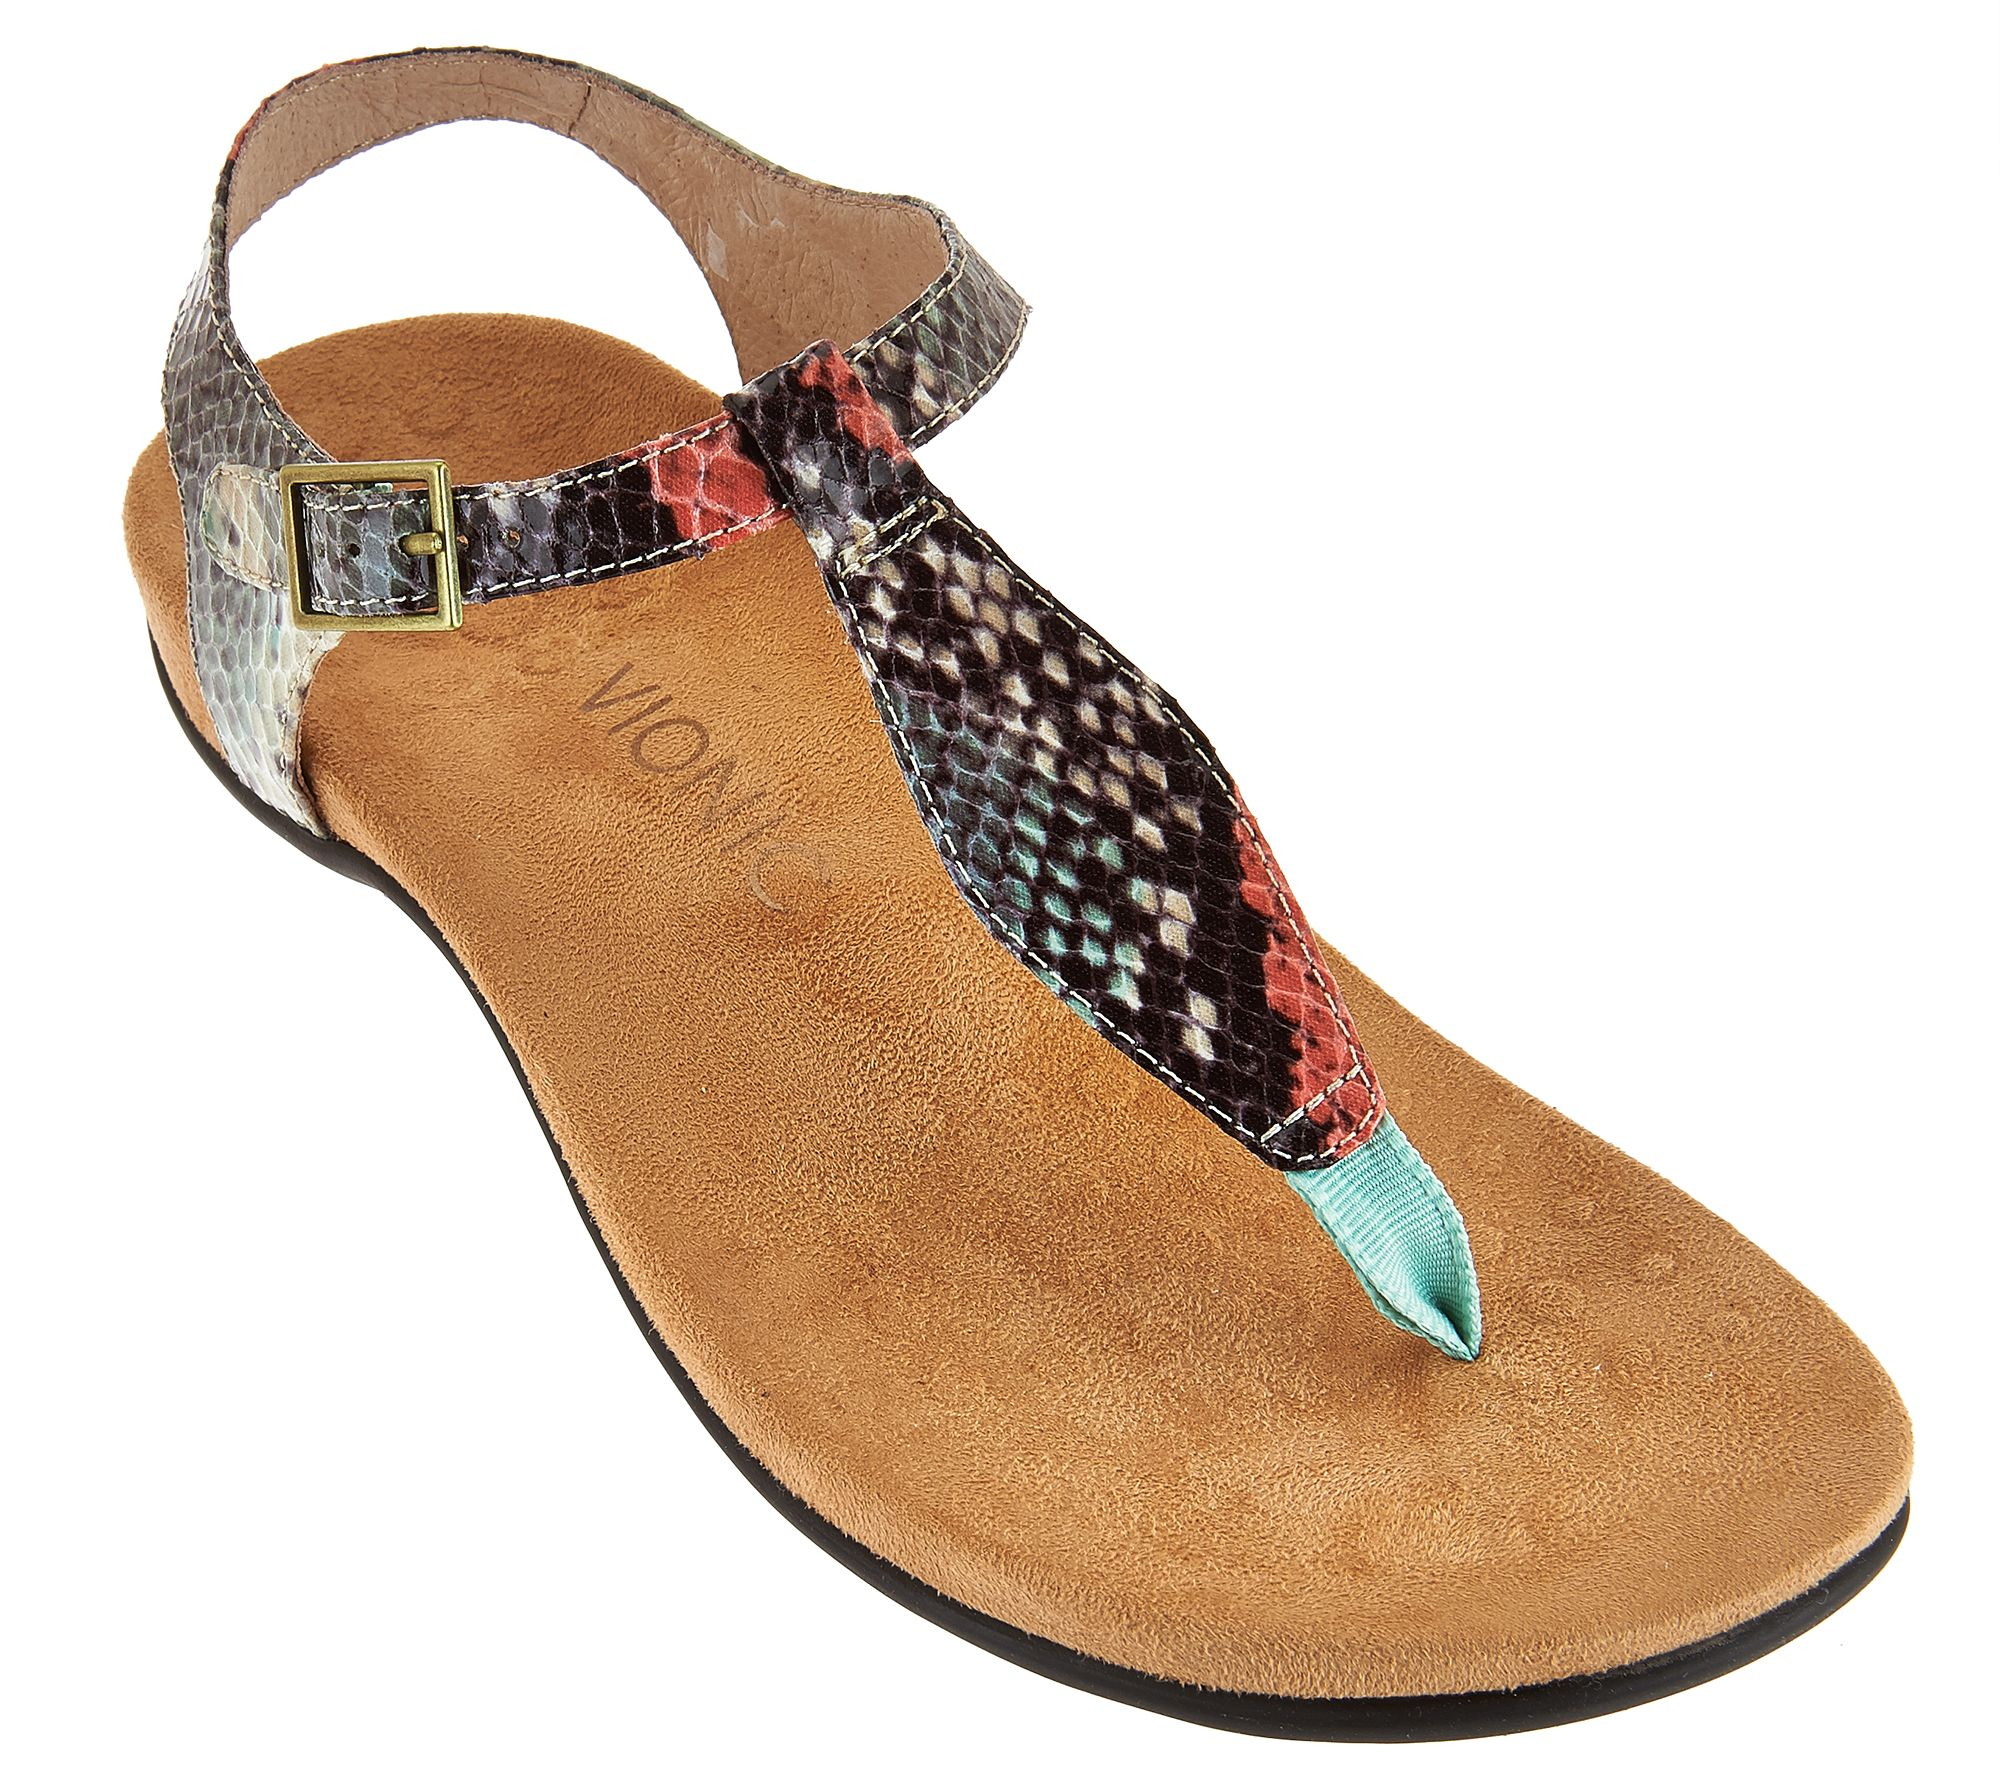 abe6a49e143b73 Vionic Orthotic T-strap Sandals w  Adj. Ankle Straps - Paden - Page 1 — QVC .com